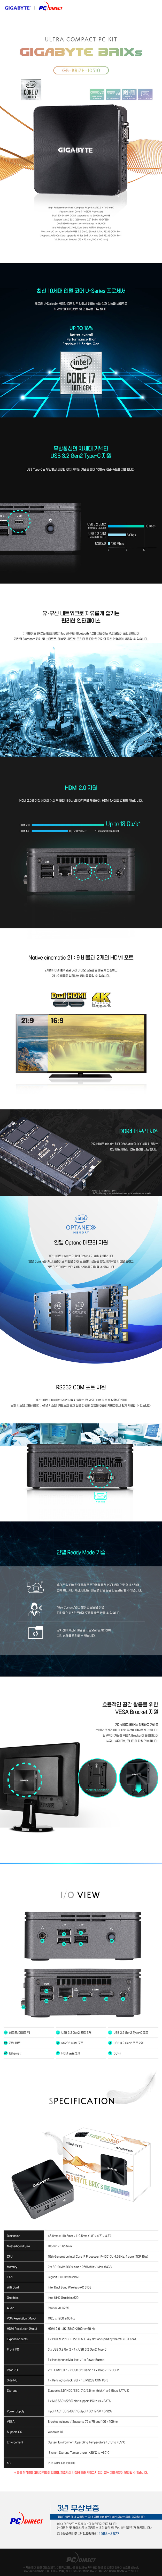 GIGABYTE BRIX GB-BRi7H-10510 M2 피씨디렉트 (16GB, M2 1TB)